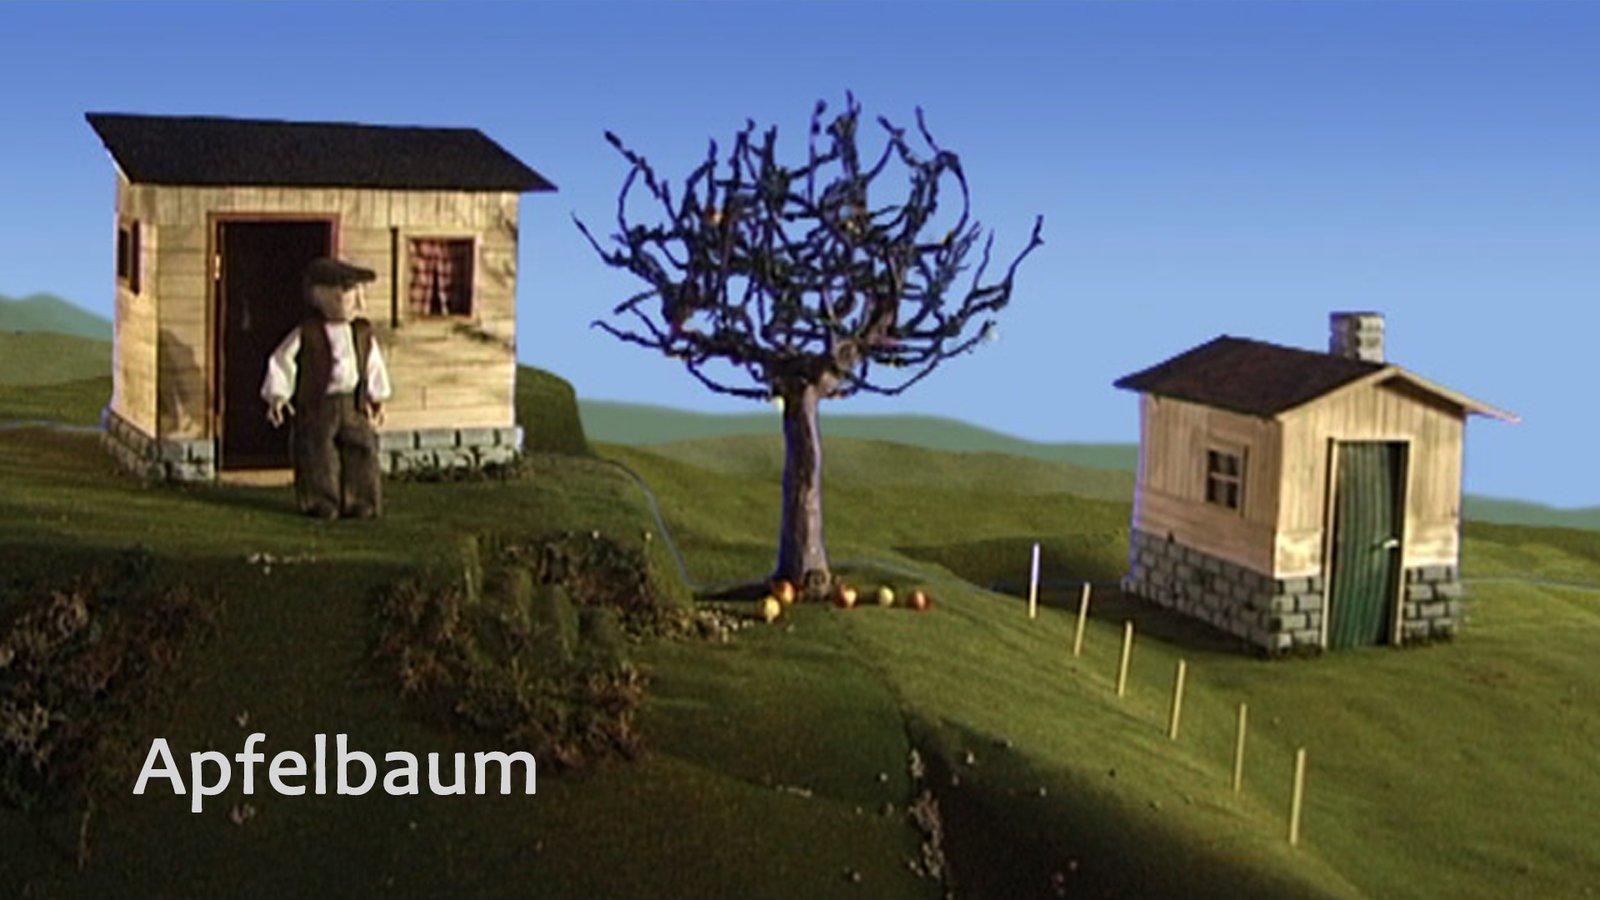 Apfelbaum (Apple tree)